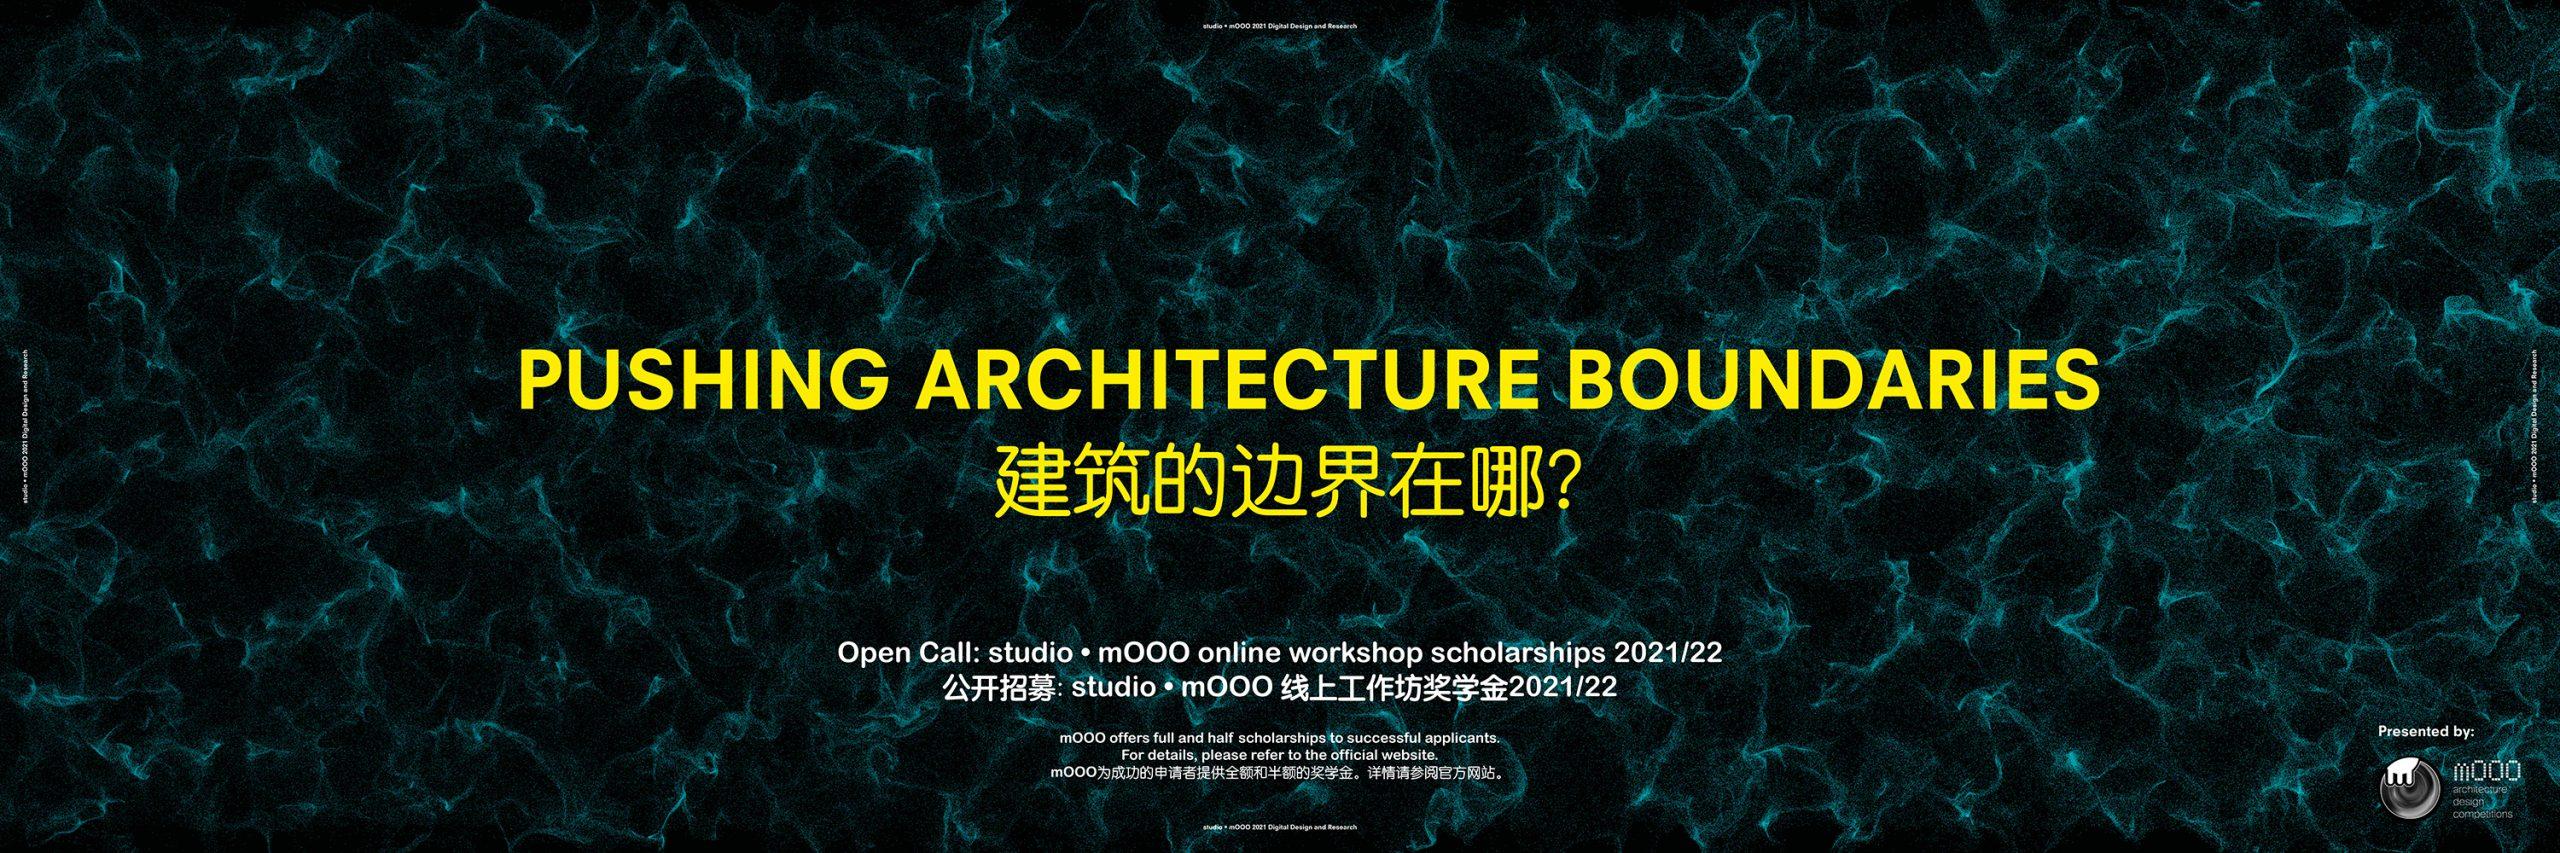 mOOO scholarships 2021/2022